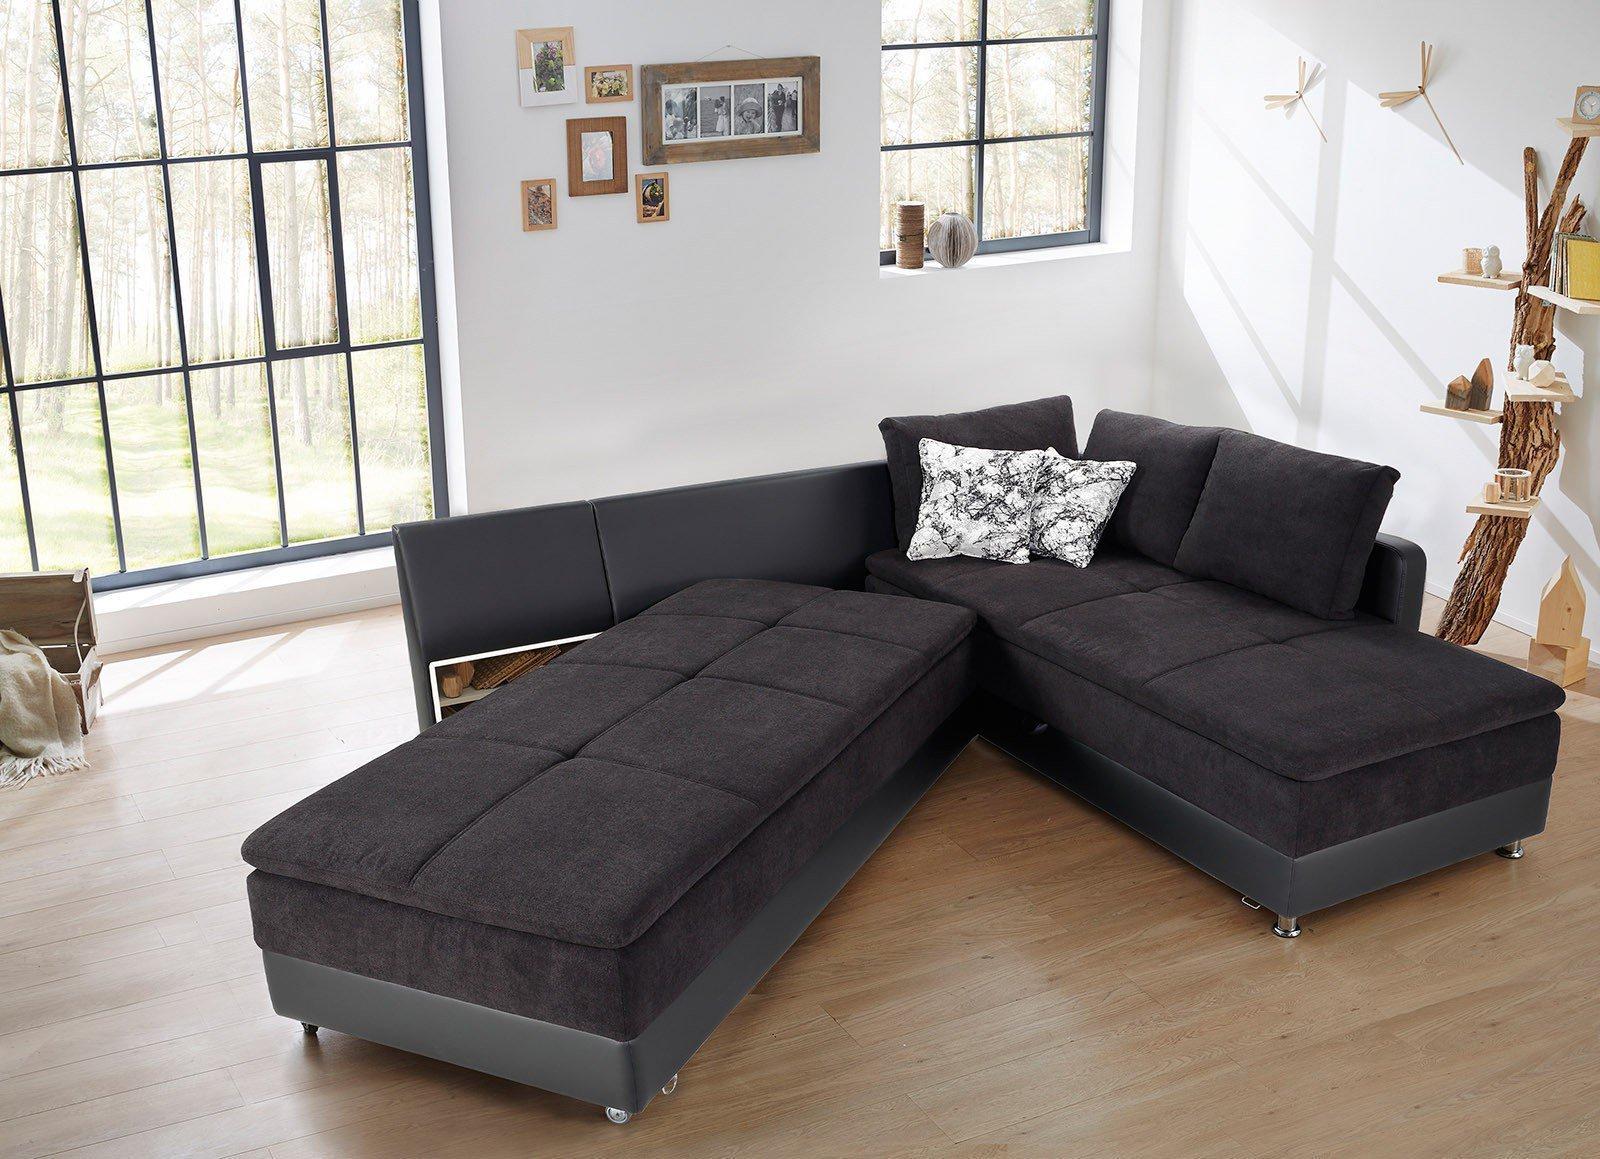 kollektion letz susanne polsterecke schwarz m bel letz ihr online shop. Black Bedroom Furniture Sets. Home Design Ideas